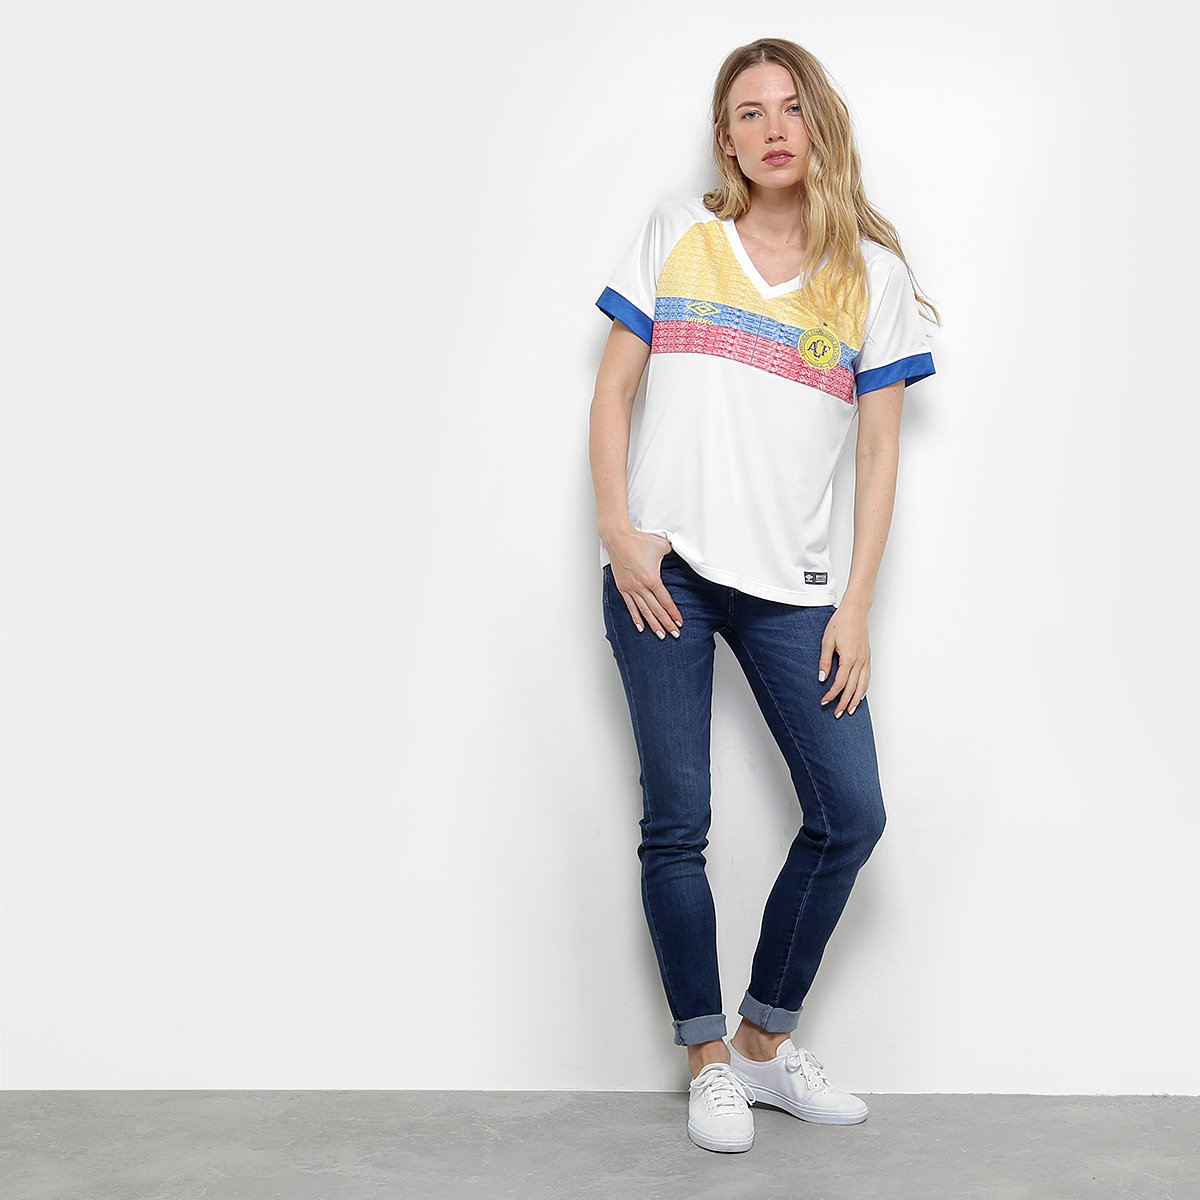 Umbro Torcedor n° II e Pasion Branco La Azul Feminina s Chapecoense 2018 Camisa B0Aqf